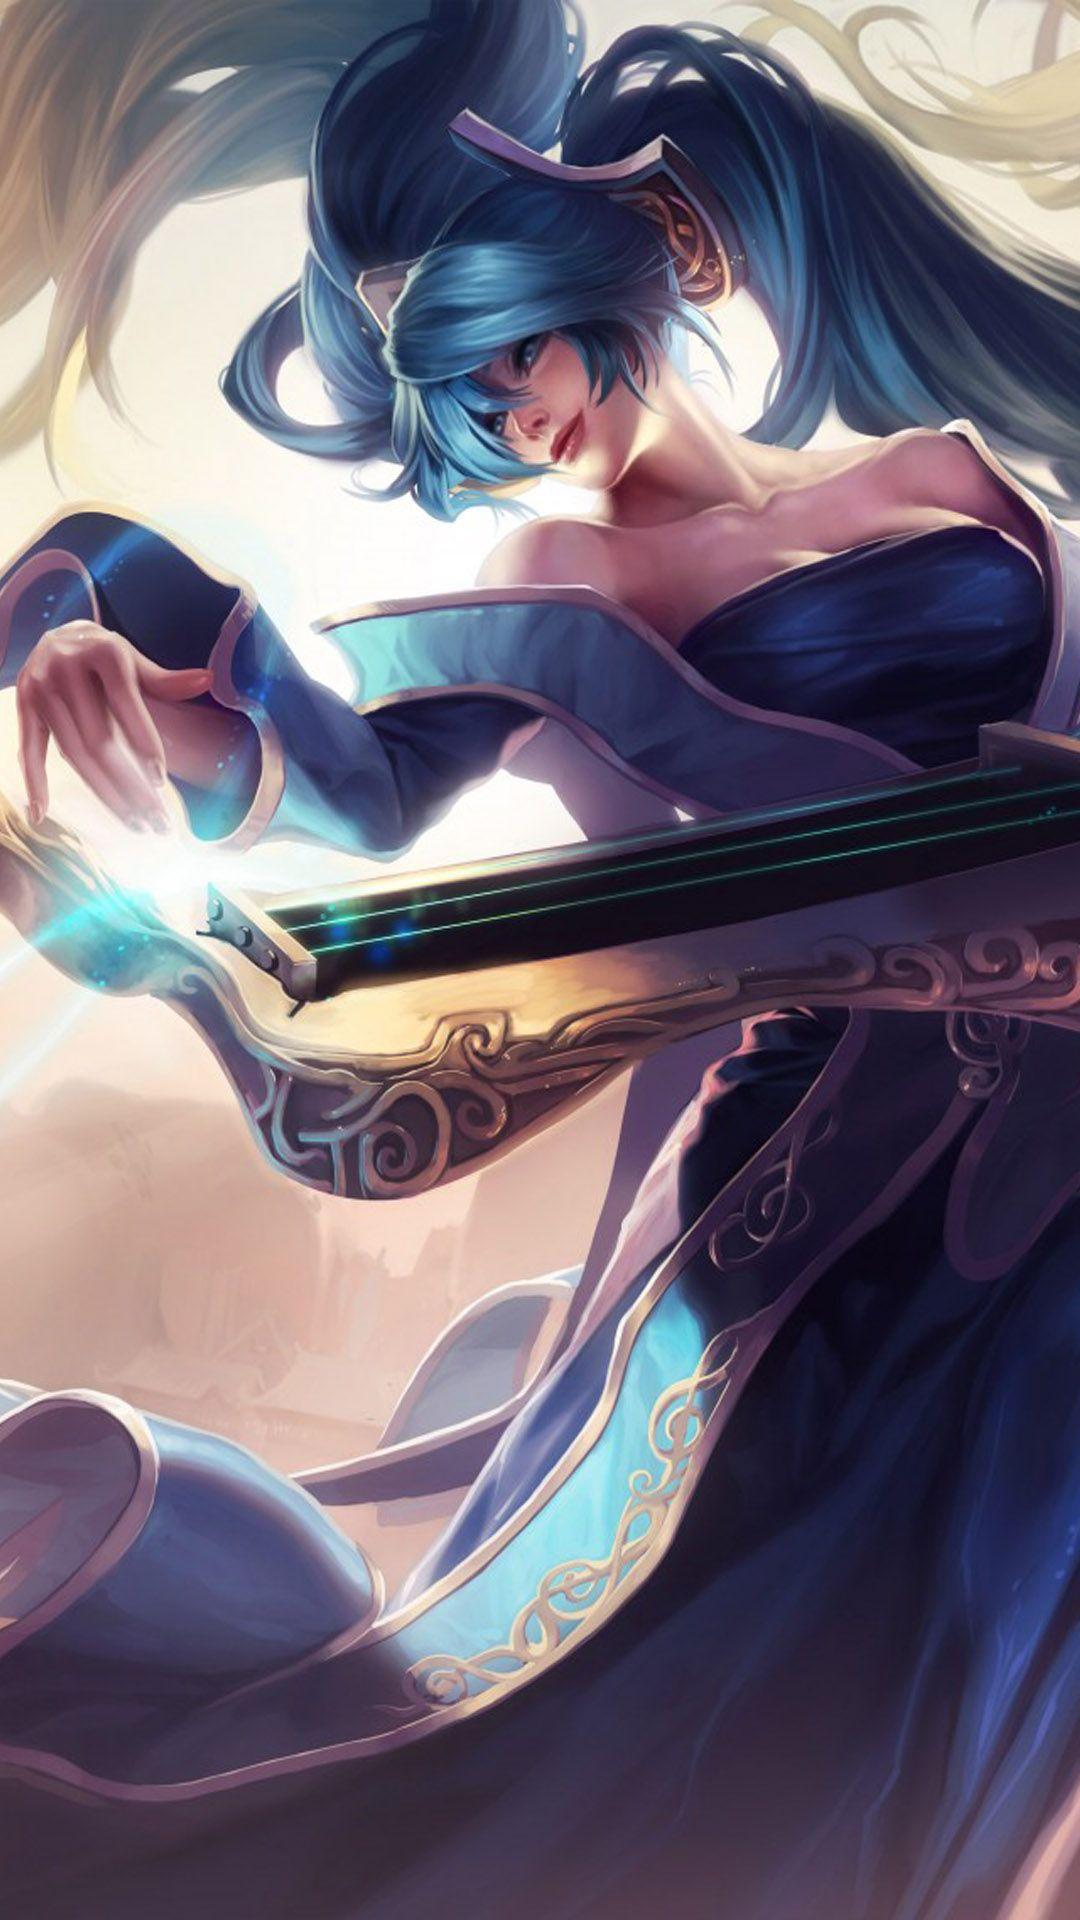 Sona League Of Legends 4k Ultra Hd Mobile Wallpaper In 2021 League Of Legends Lol Champions League